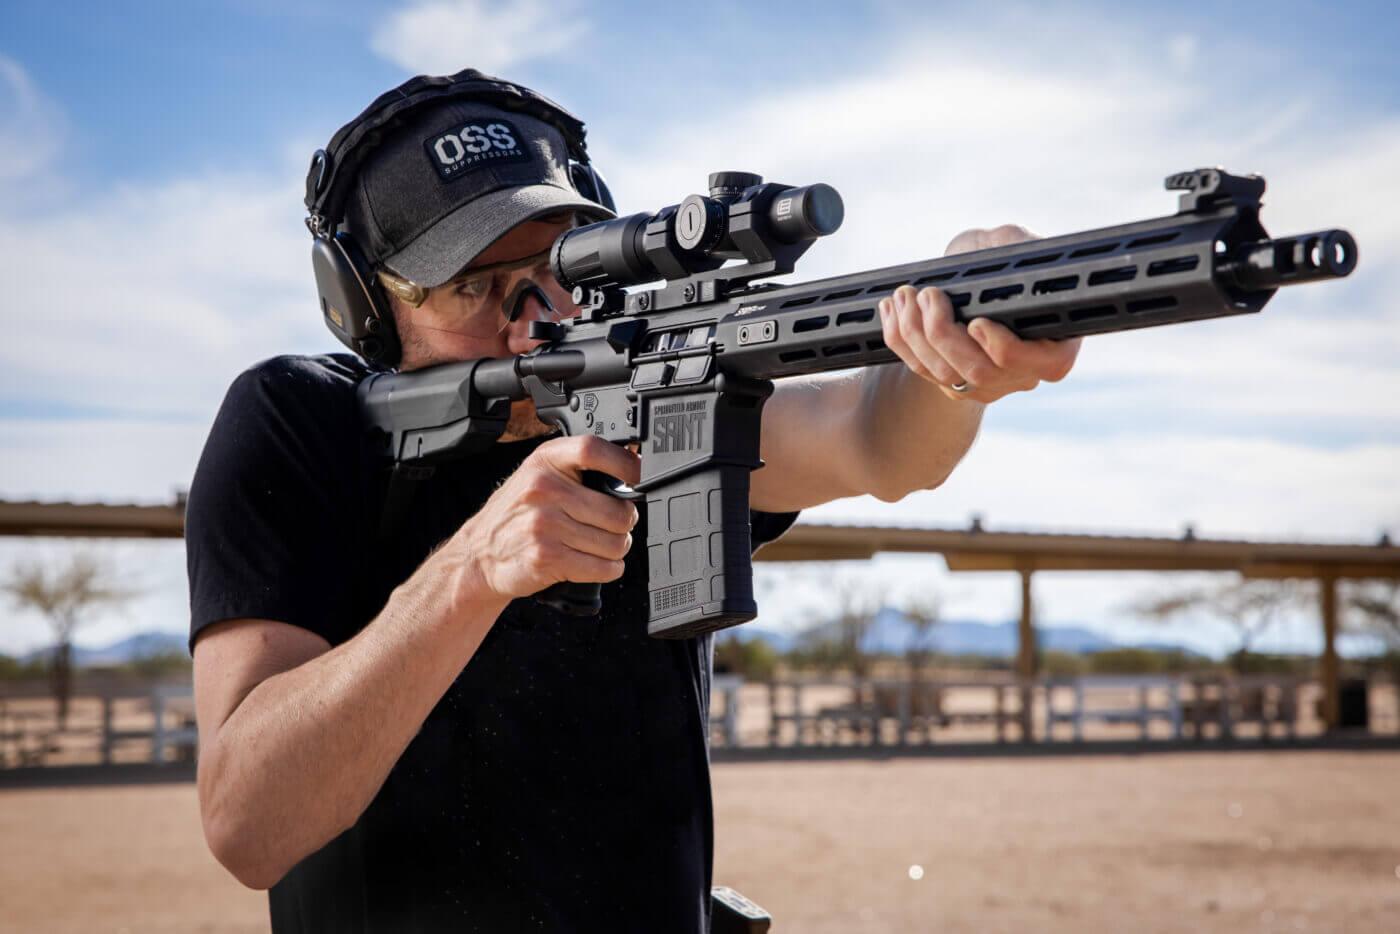 SAINT .308 rifle on the range